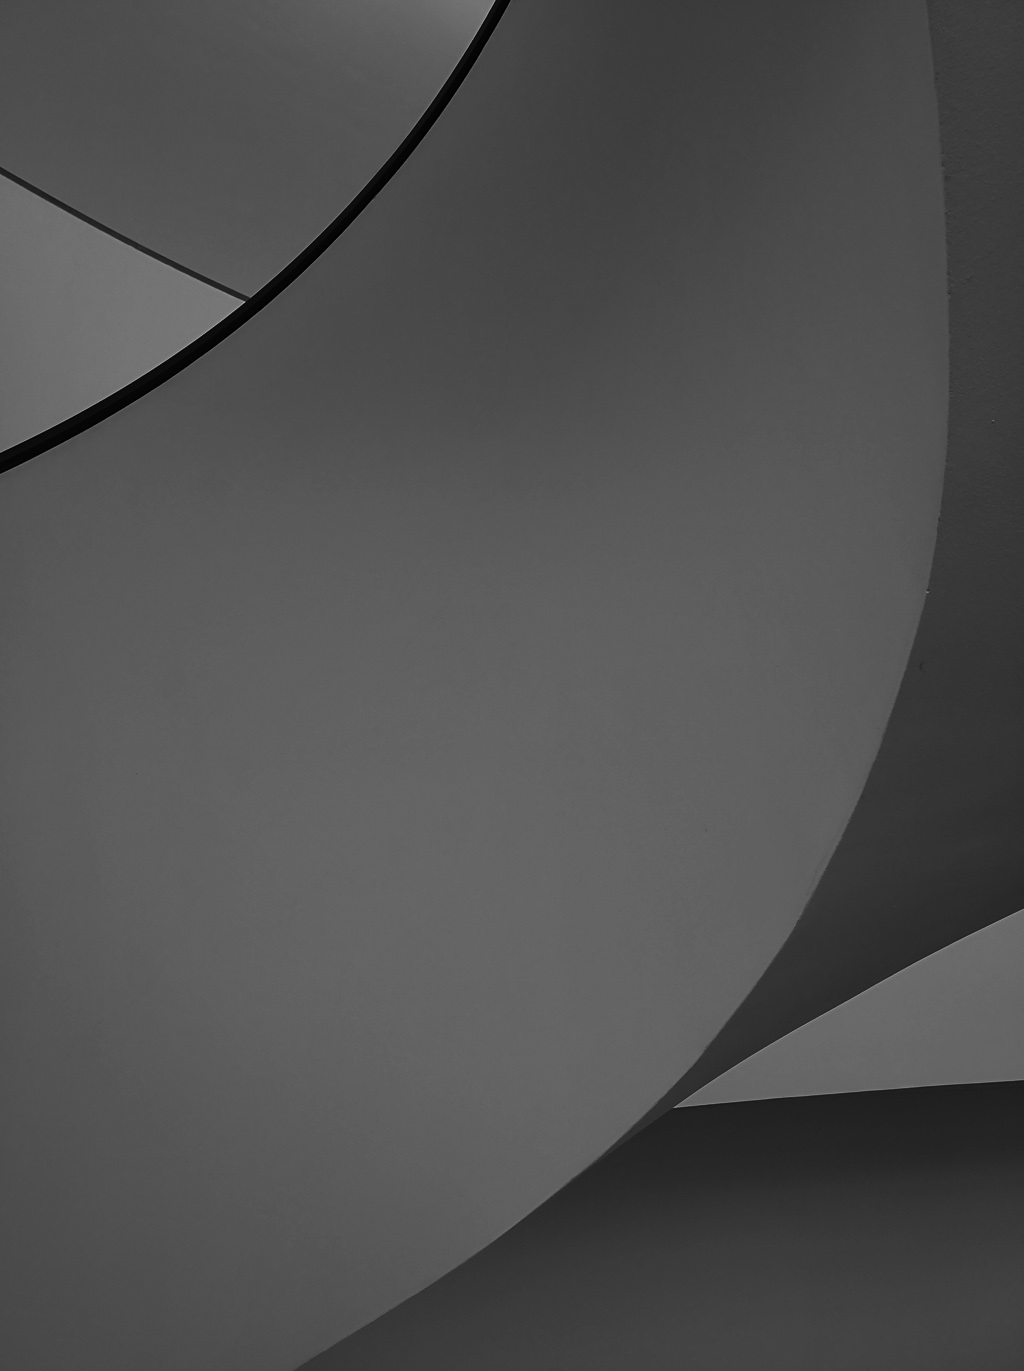 StefanFreund_Geometrie_02